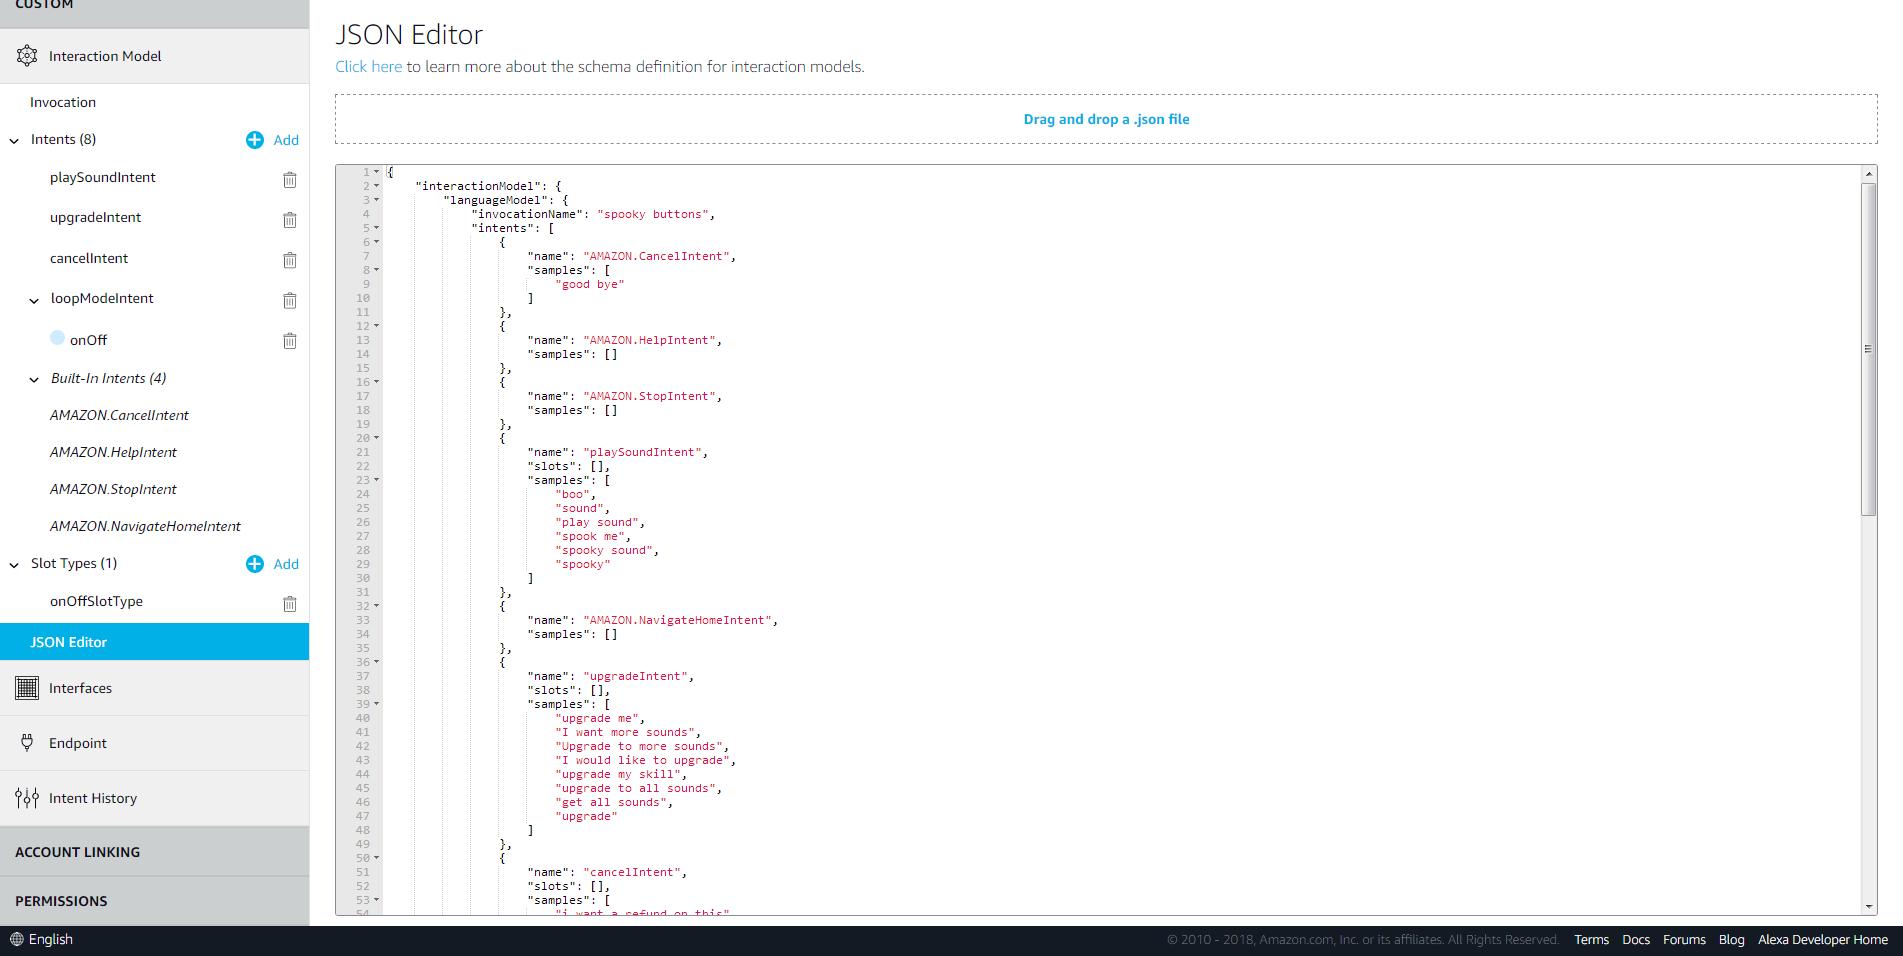 Screenshot 2018 10 08 alexa skills kit developer console blnhylmmvj